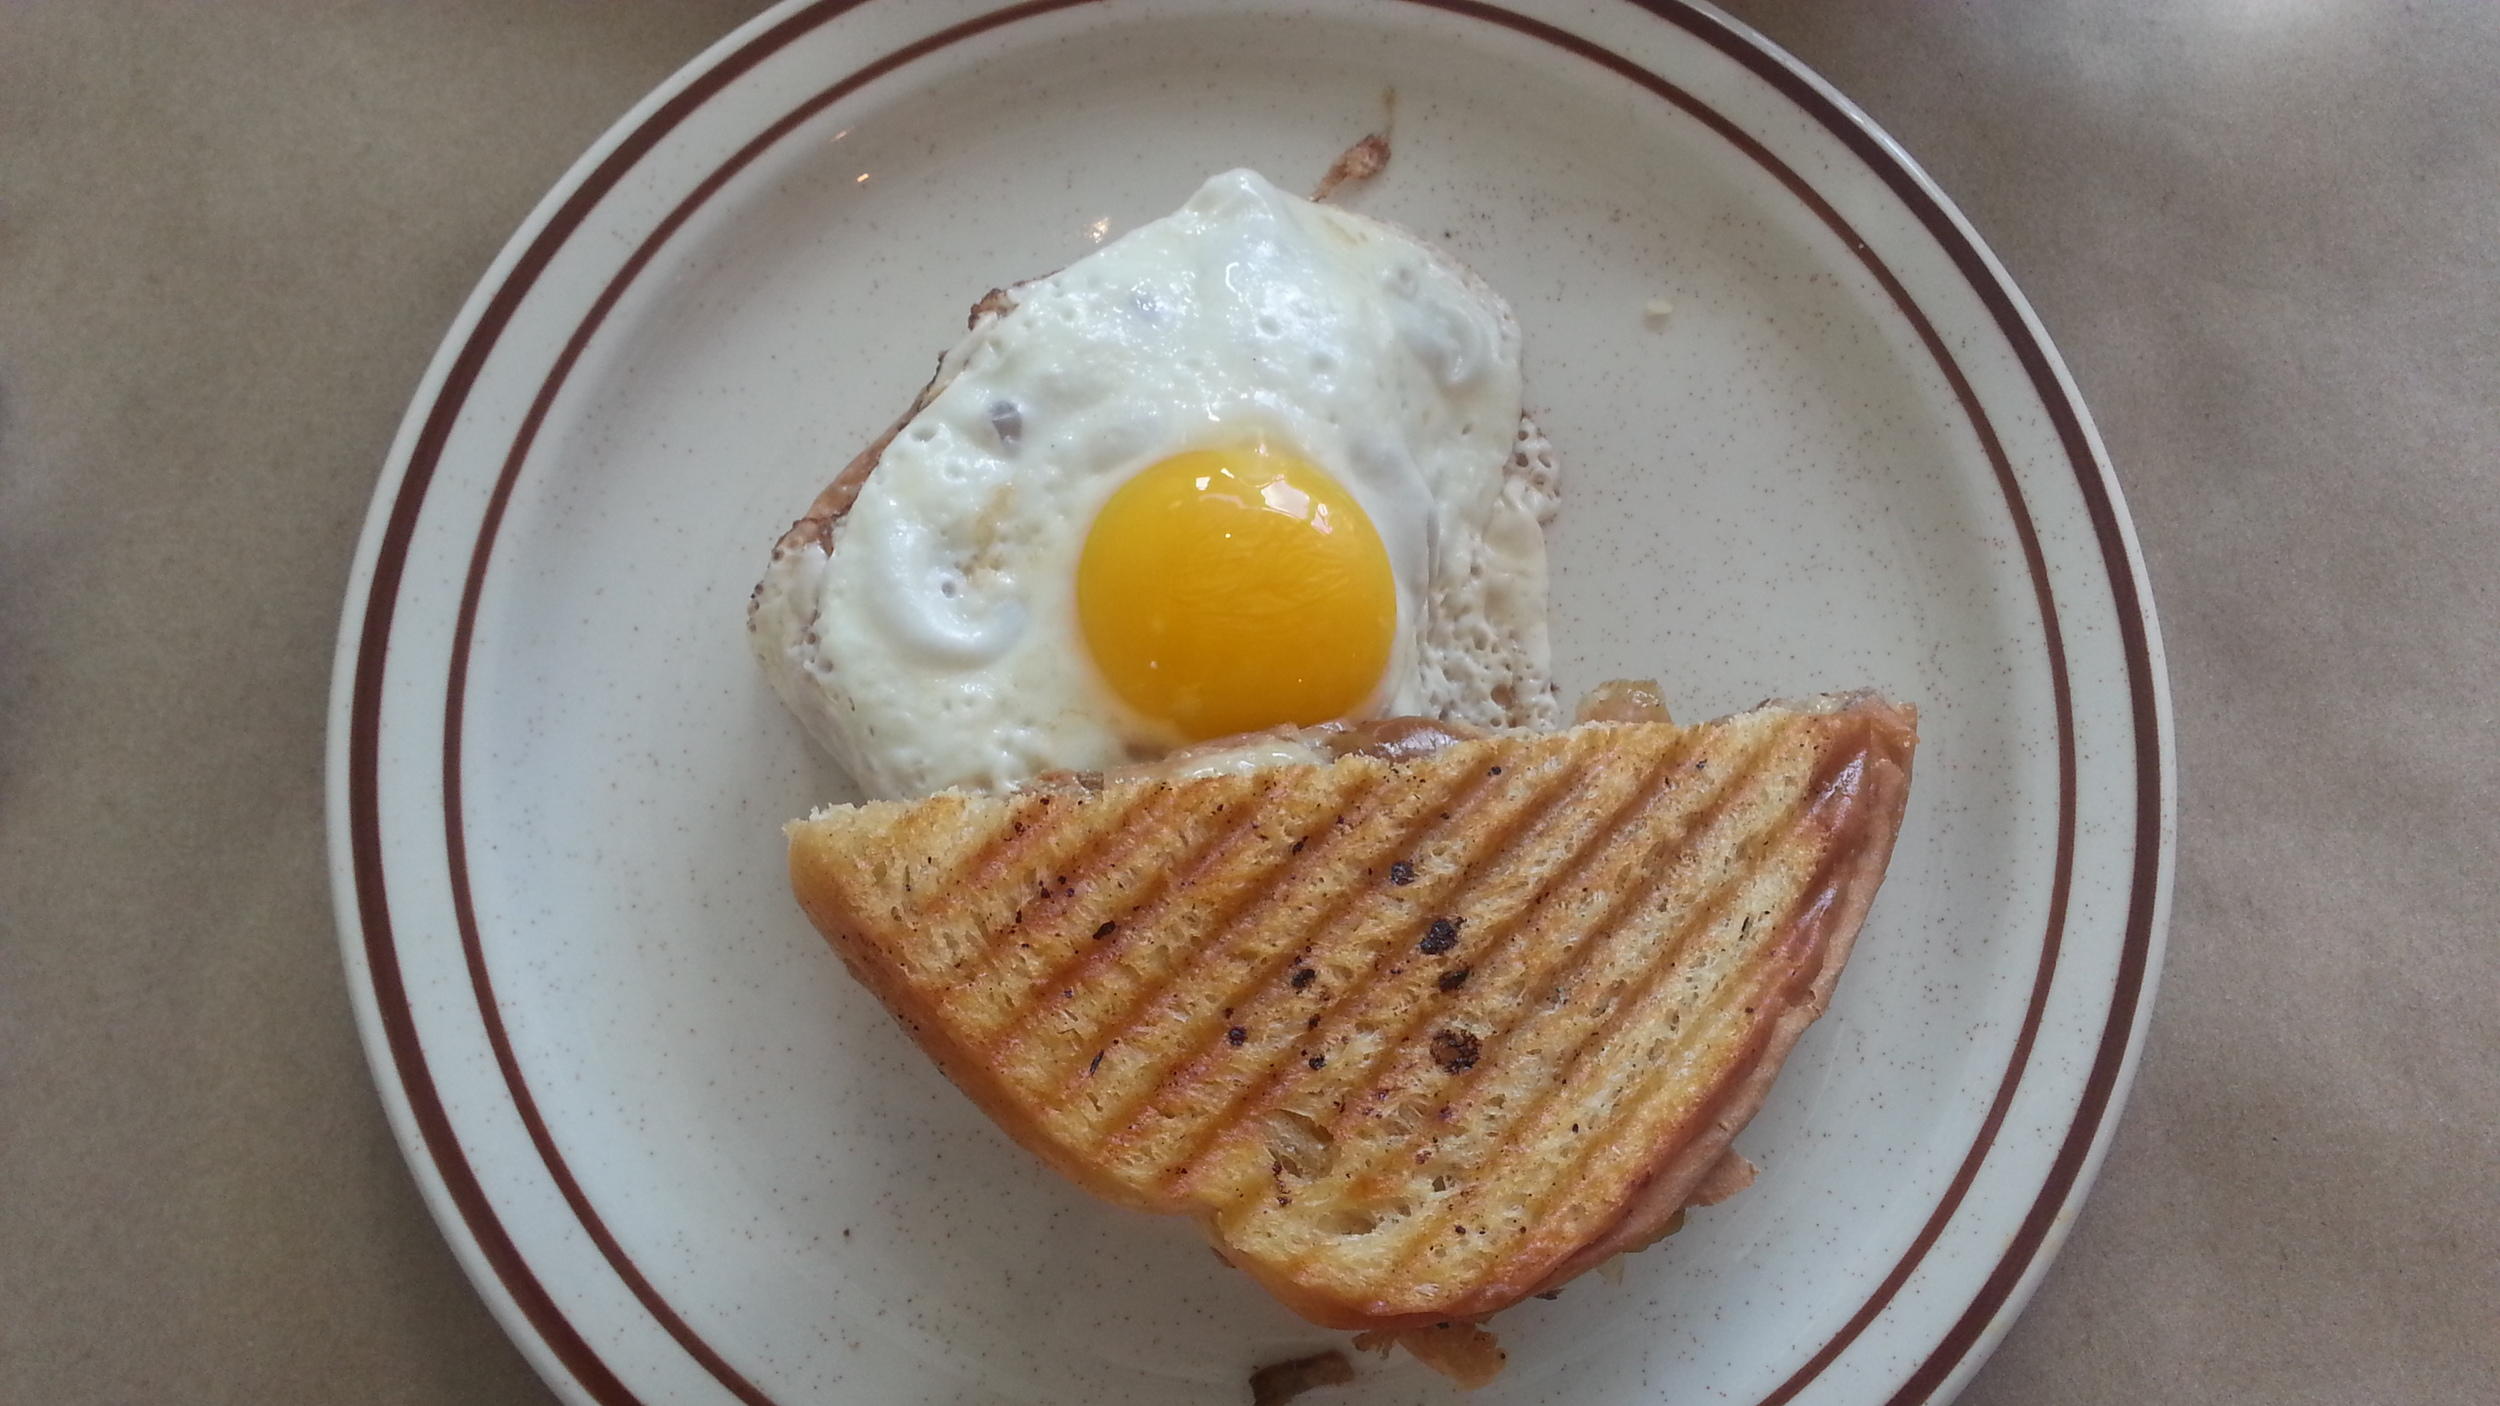 Pulled pork + caramelised apples + cheddar + sunny side-up egg grilled cheese